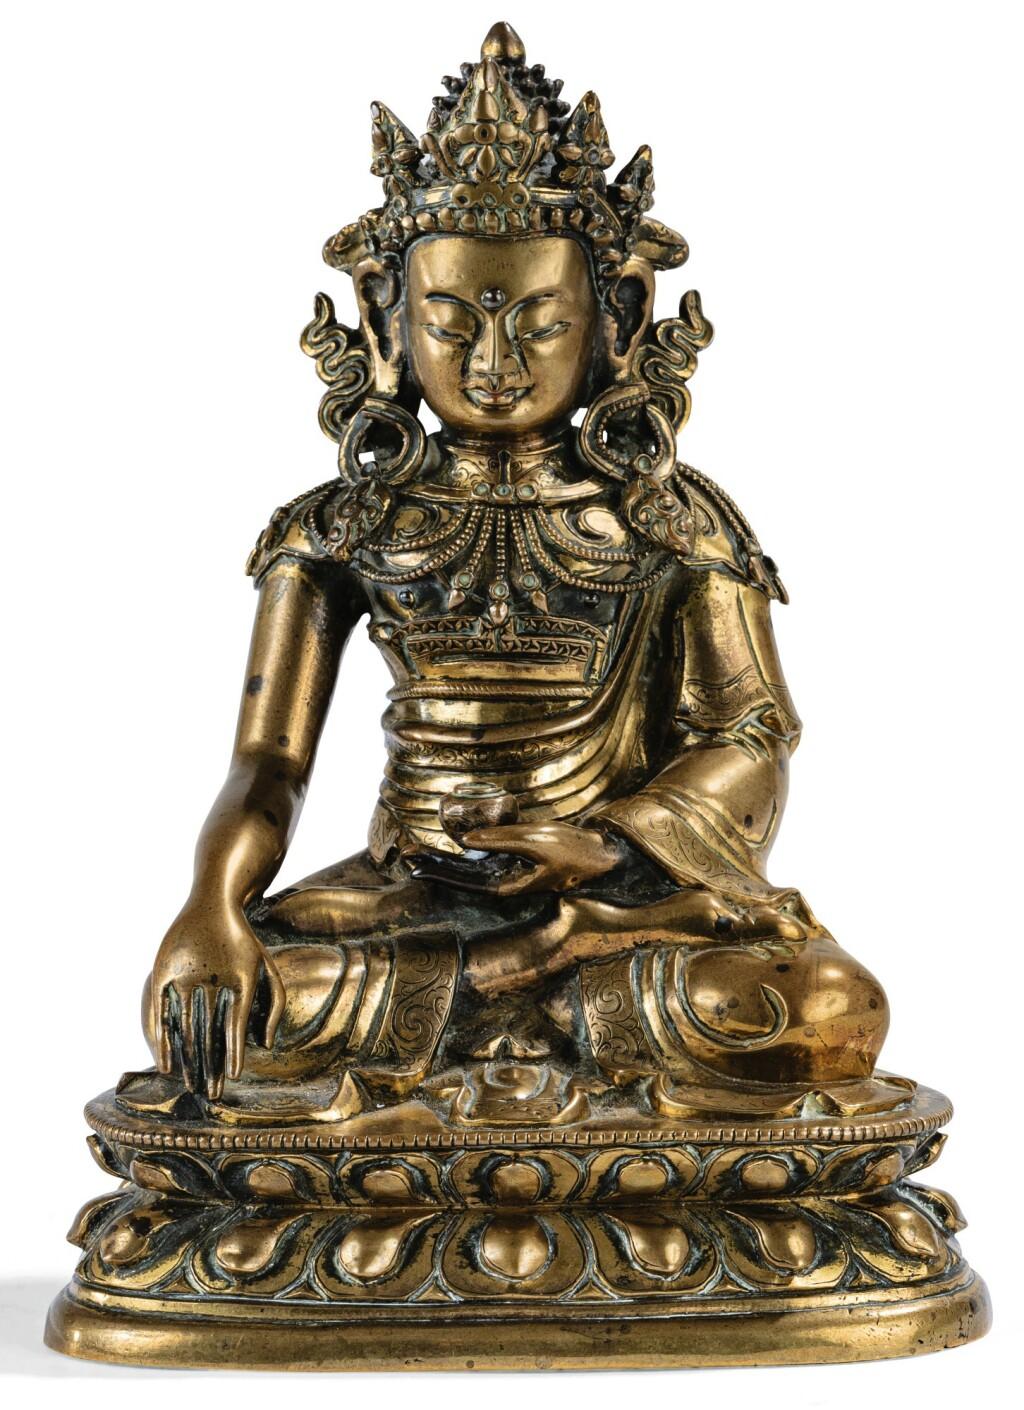 STATUETTE DE BOUDDHA EN BRONZE DORÉ DYNASTIE QING, XVIIIE SIÈCLE | 清十八世紀 鎏金銅佛坐像 | A gilt bronze figure of Buddha, Qing Dynasty, 18th century